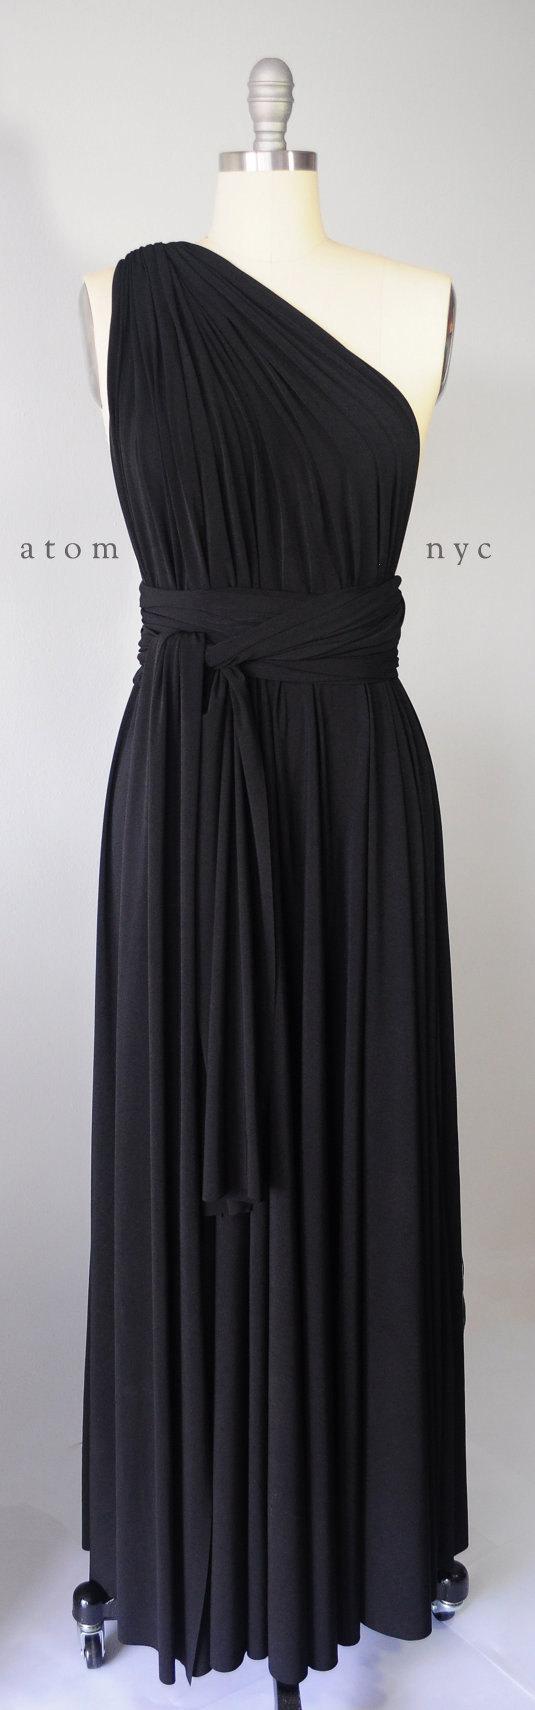 Свадьба - Black Long Maxi Infinity Dress Gown Convertible Formal Multiway Wrap Dress Bridesmaid Dress Evening Dress Toga Dress